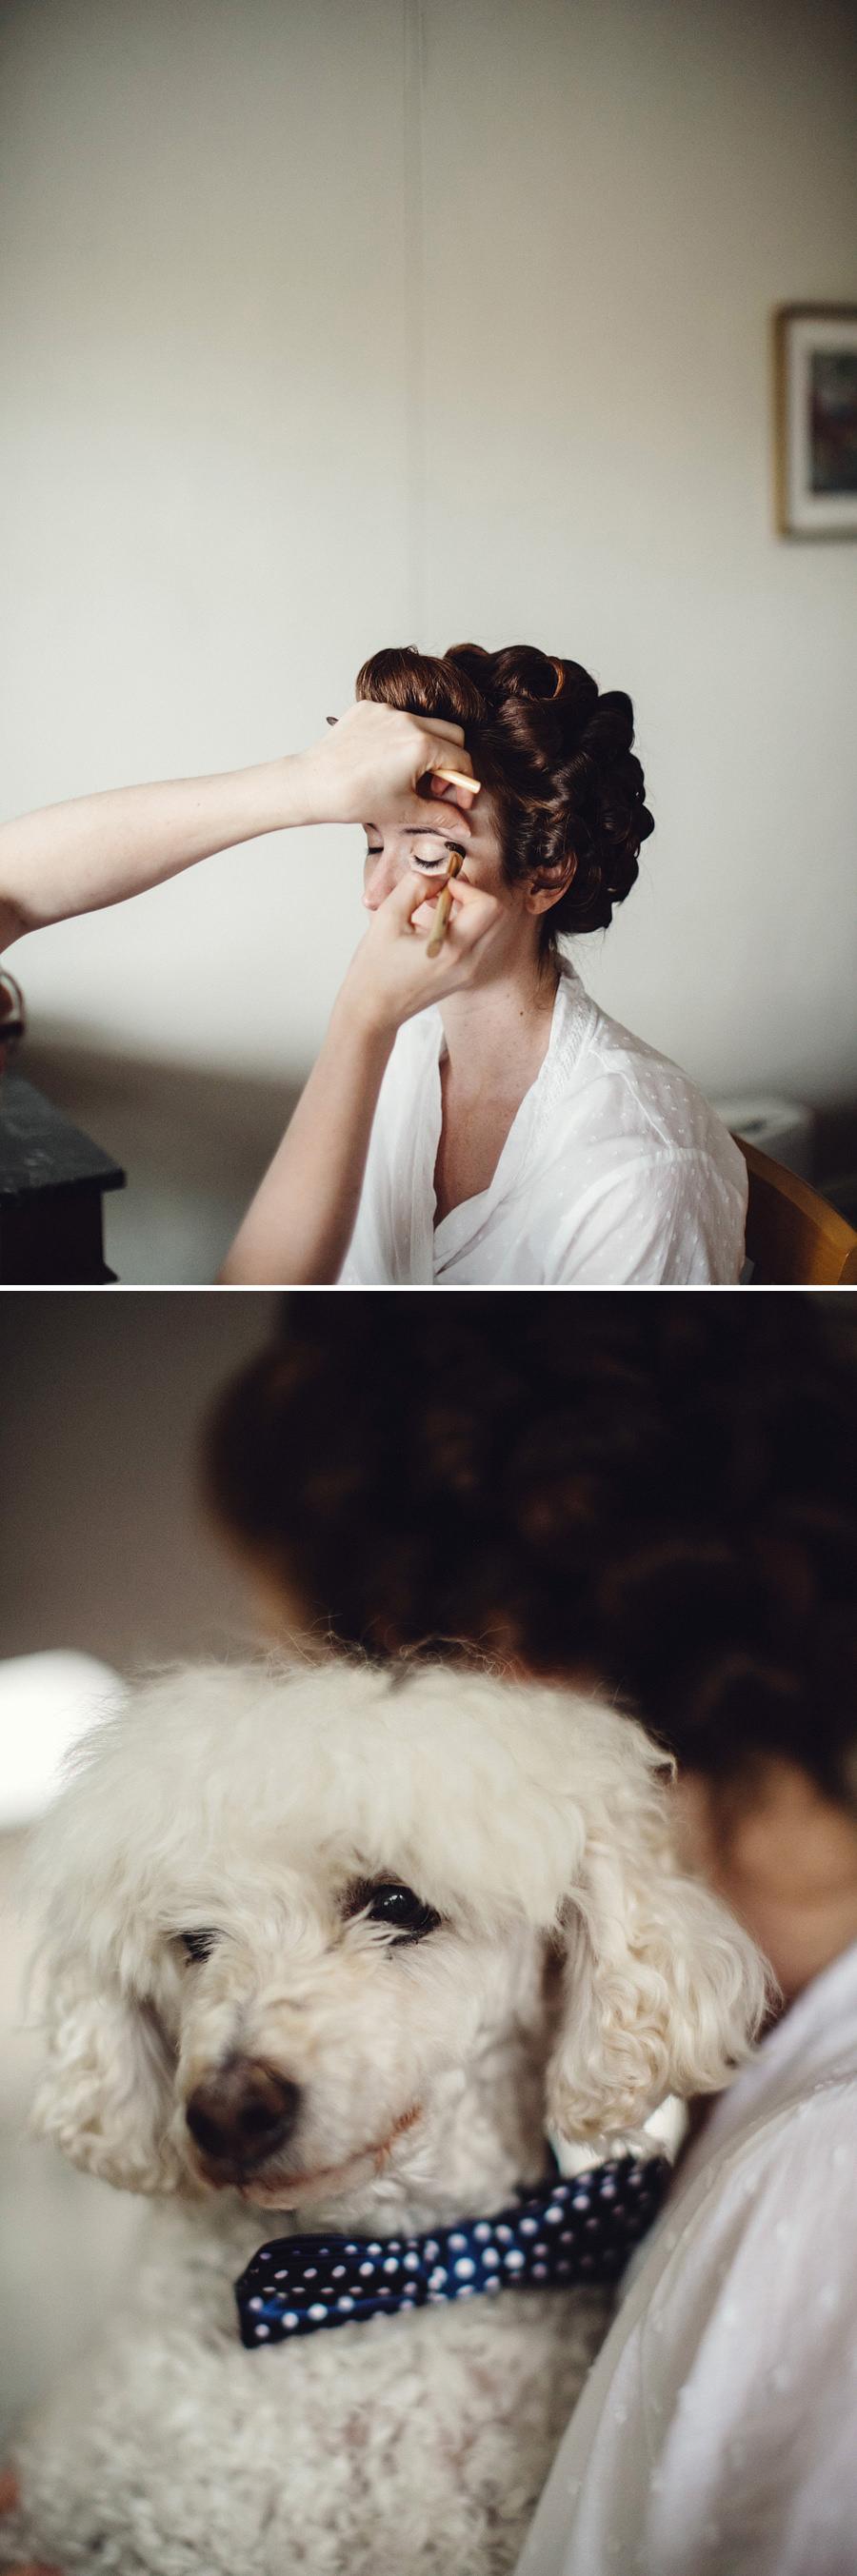 Bondi Wedding Photographers: Girls getting ready